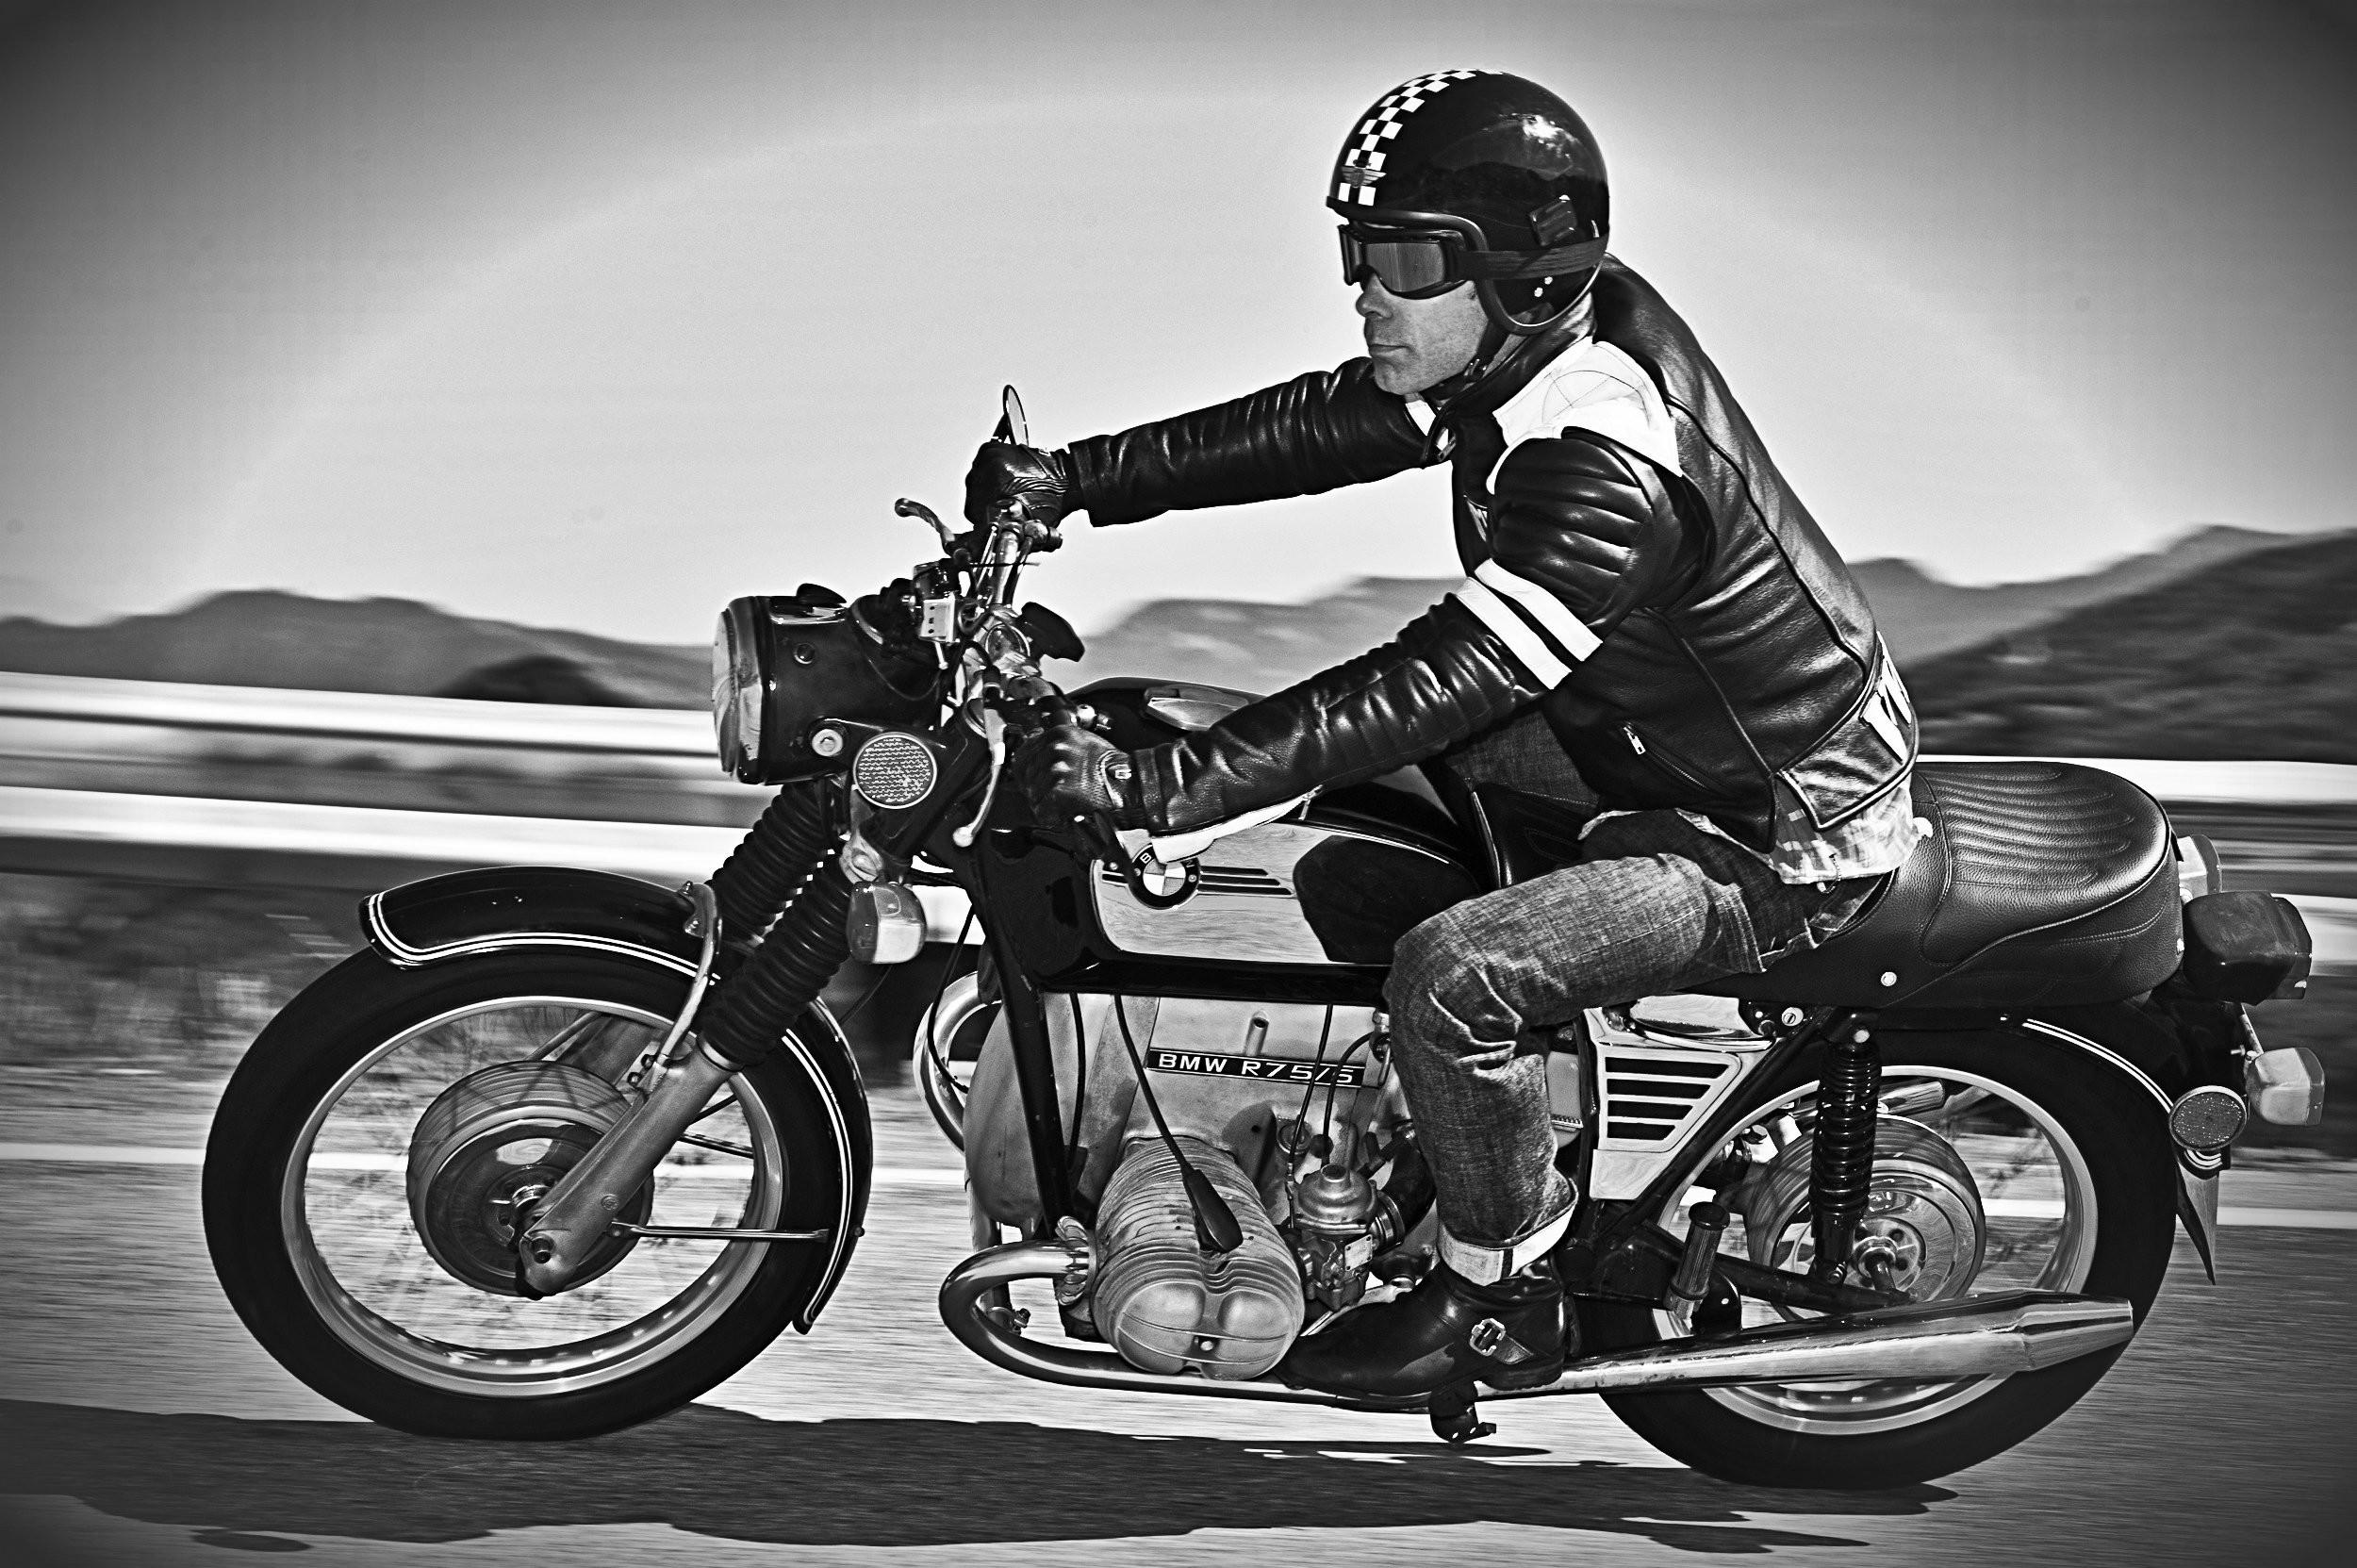 Винтажный мотоцикл картинки